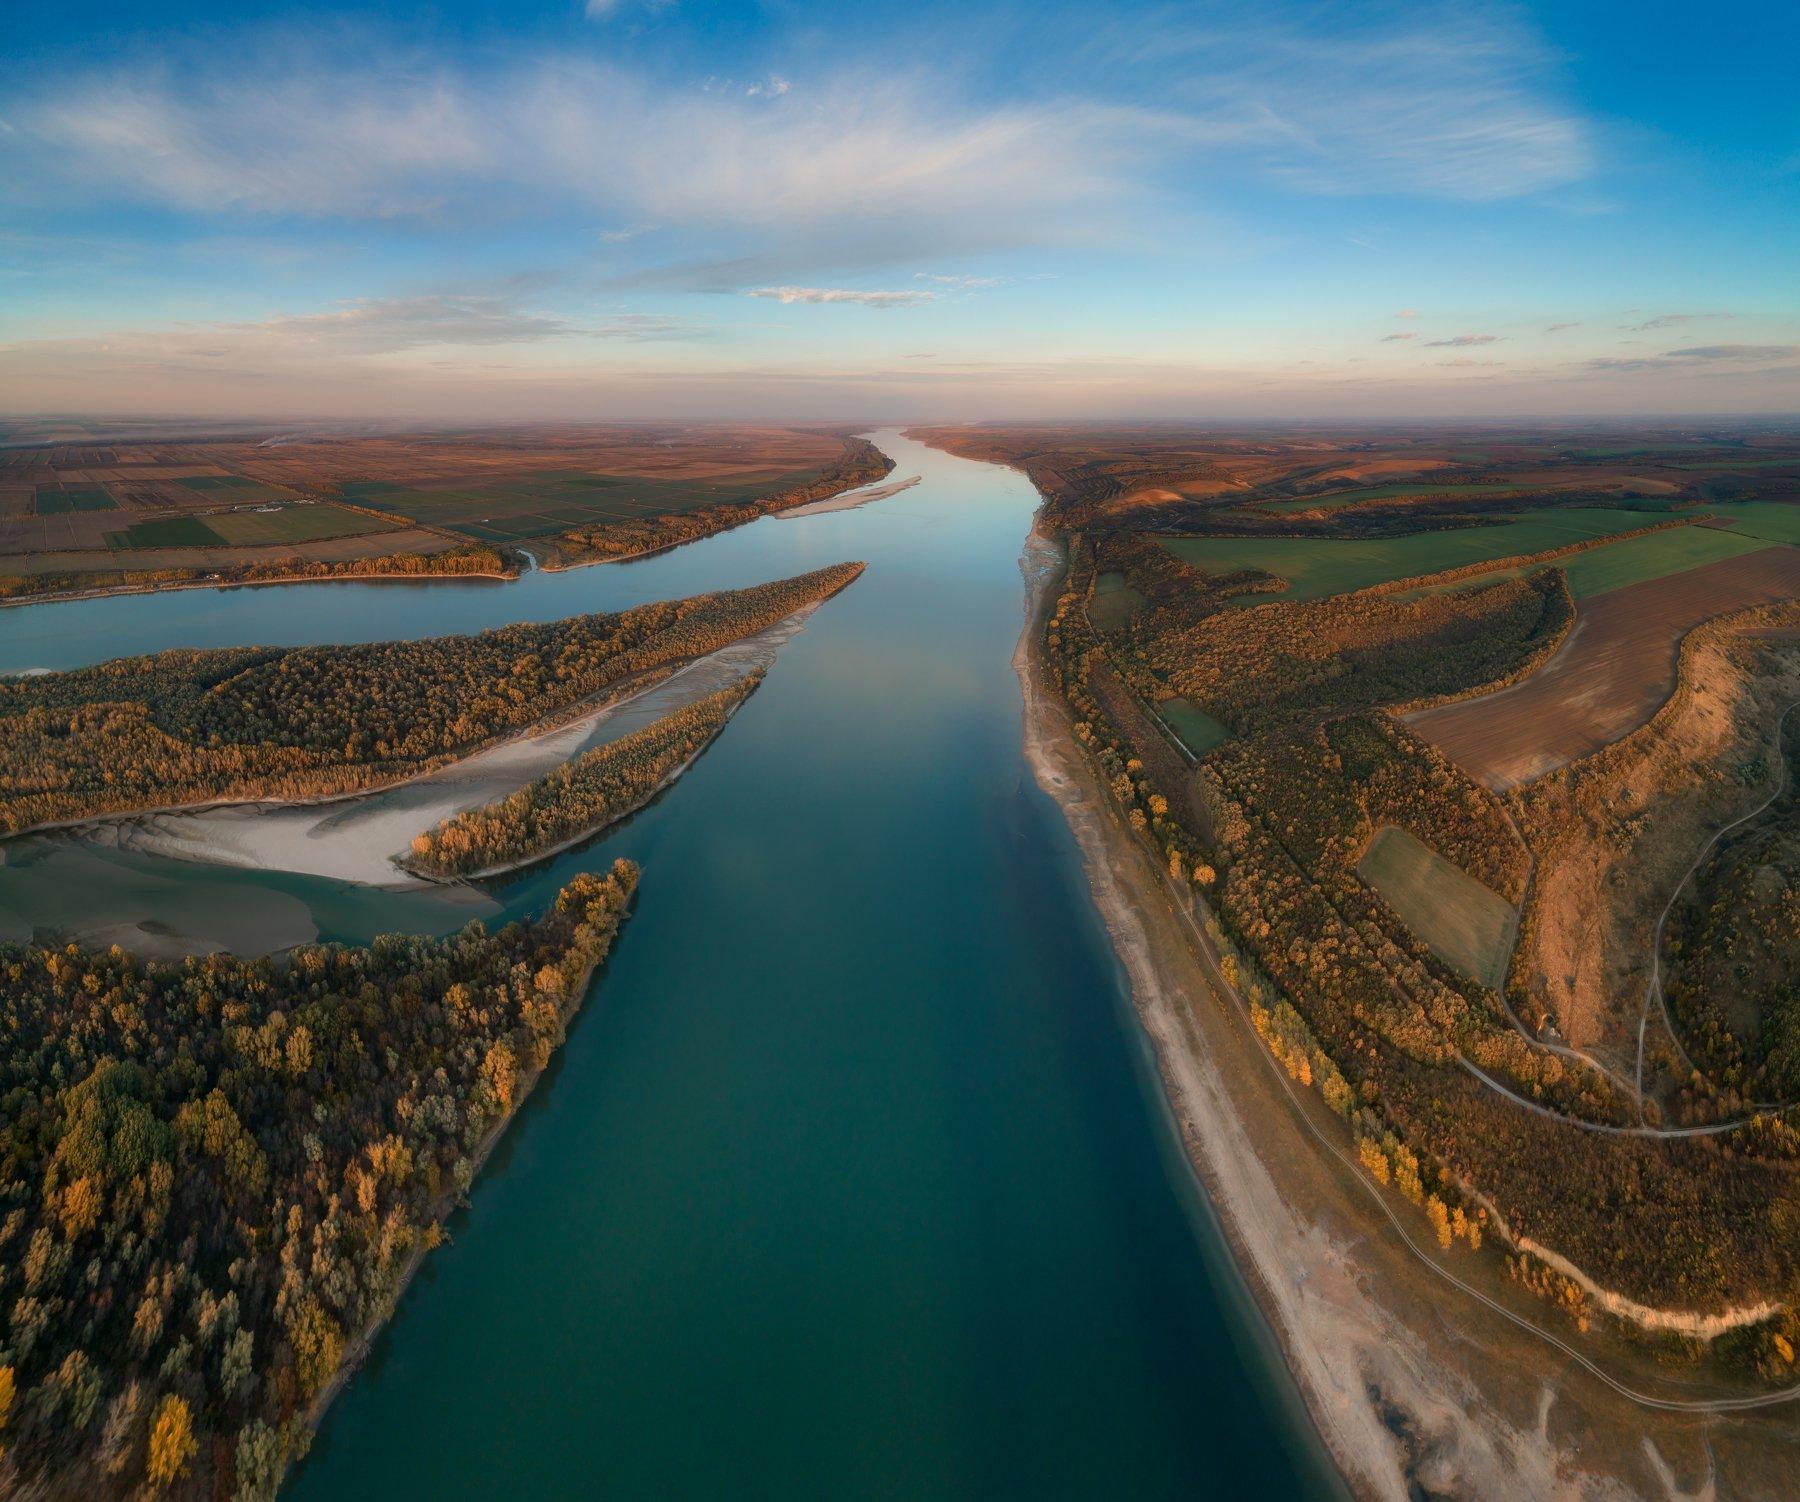 дунай,река,осень,болгария,румыния, Даниел Балъков